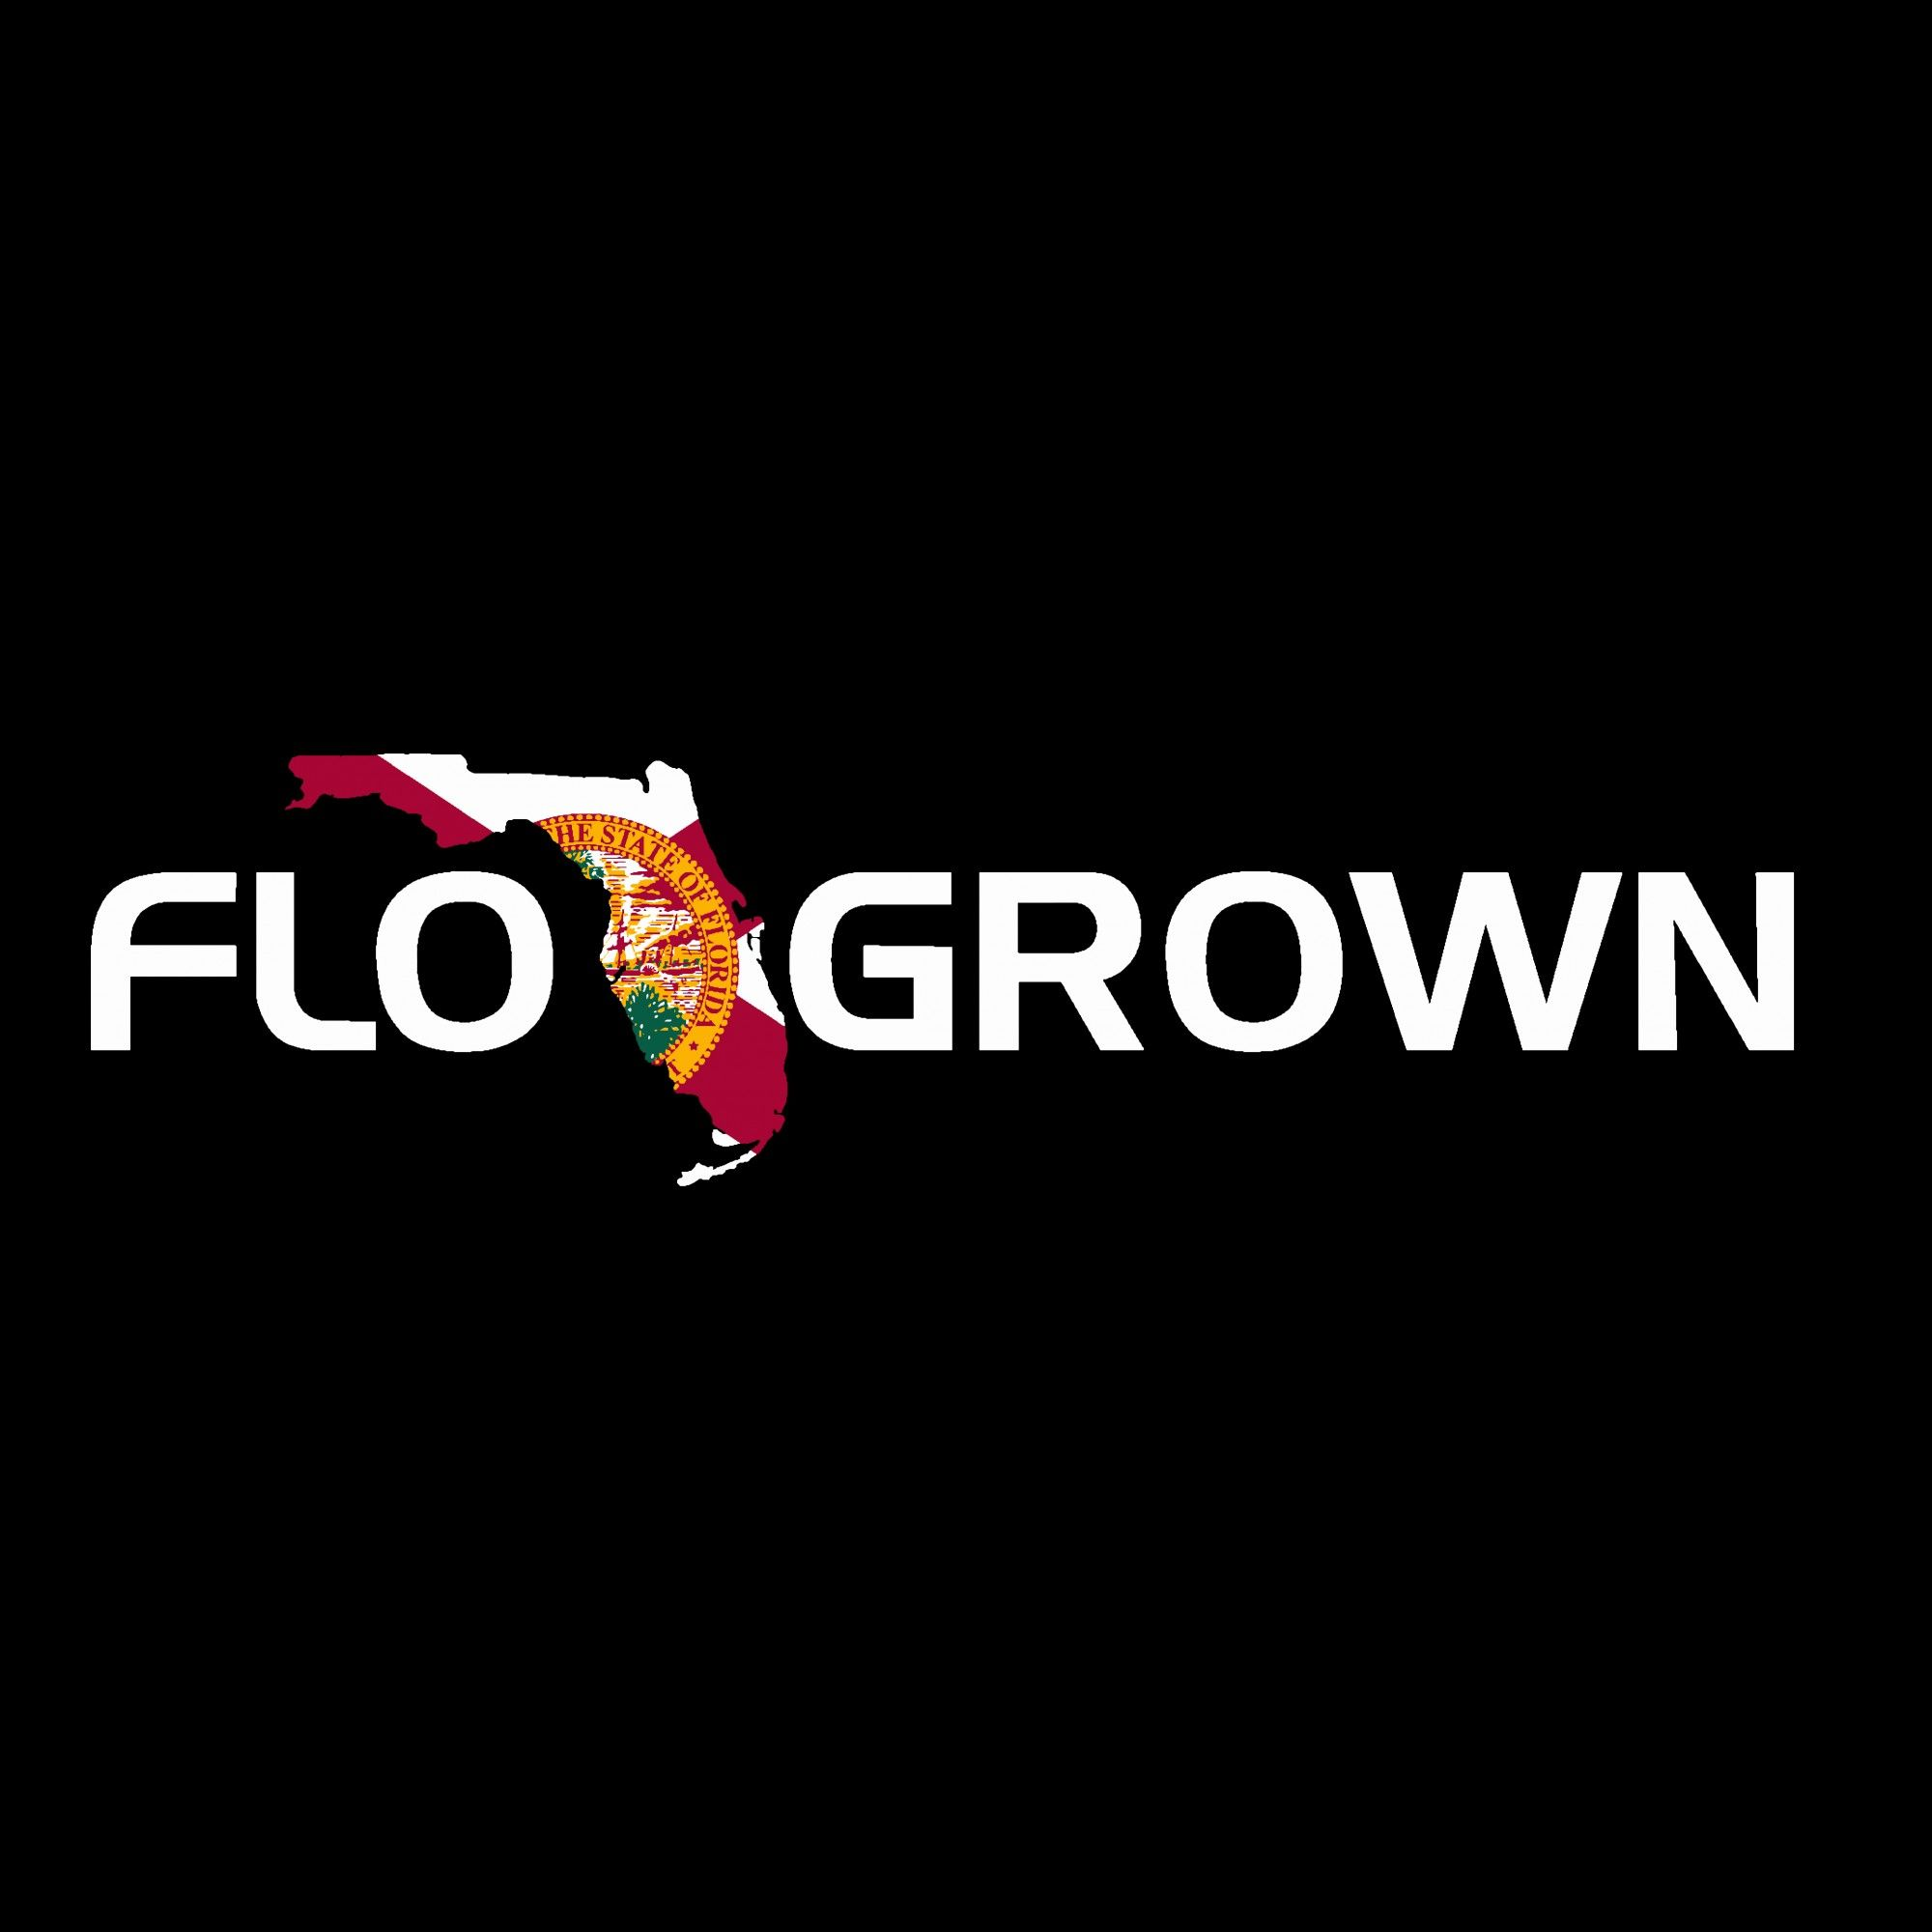 Florida Flag Decal Florida Flag Florida Fb Cover Photos